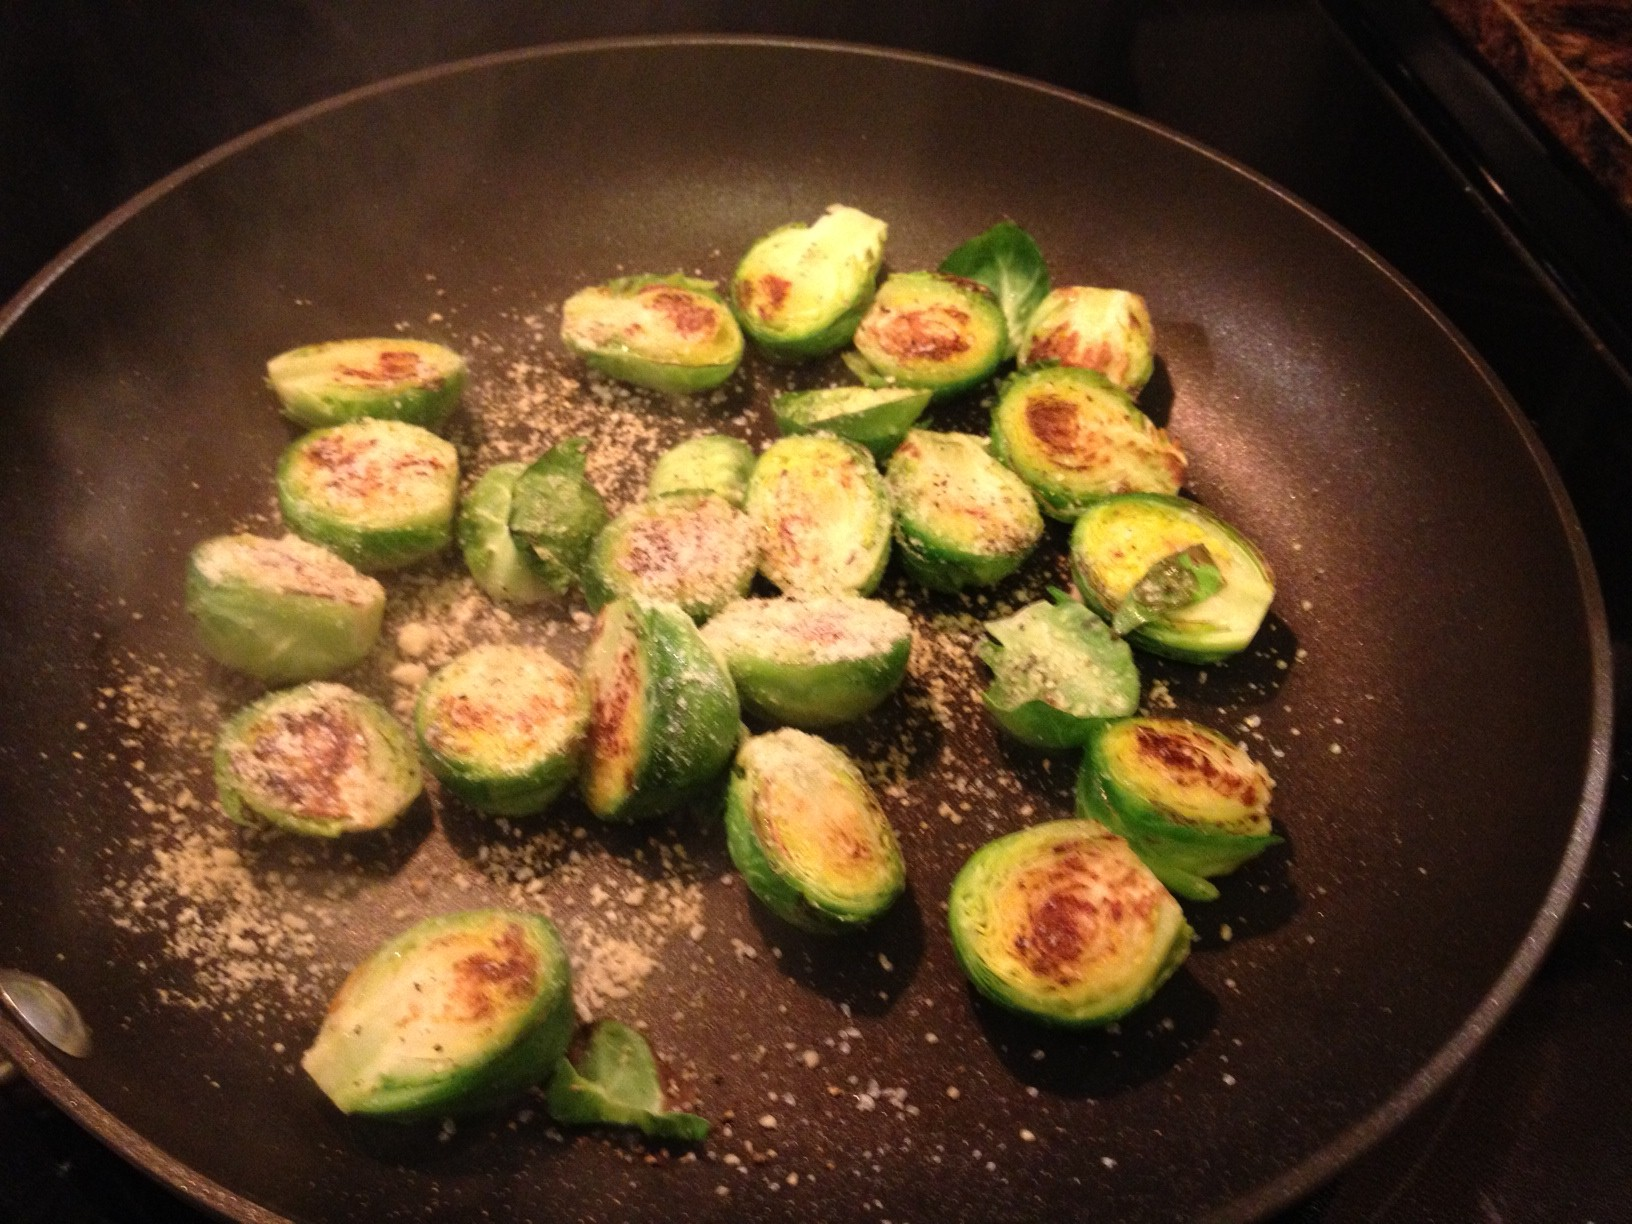 Lemon Parmesan Brussels Sprouts | This RD Eats!